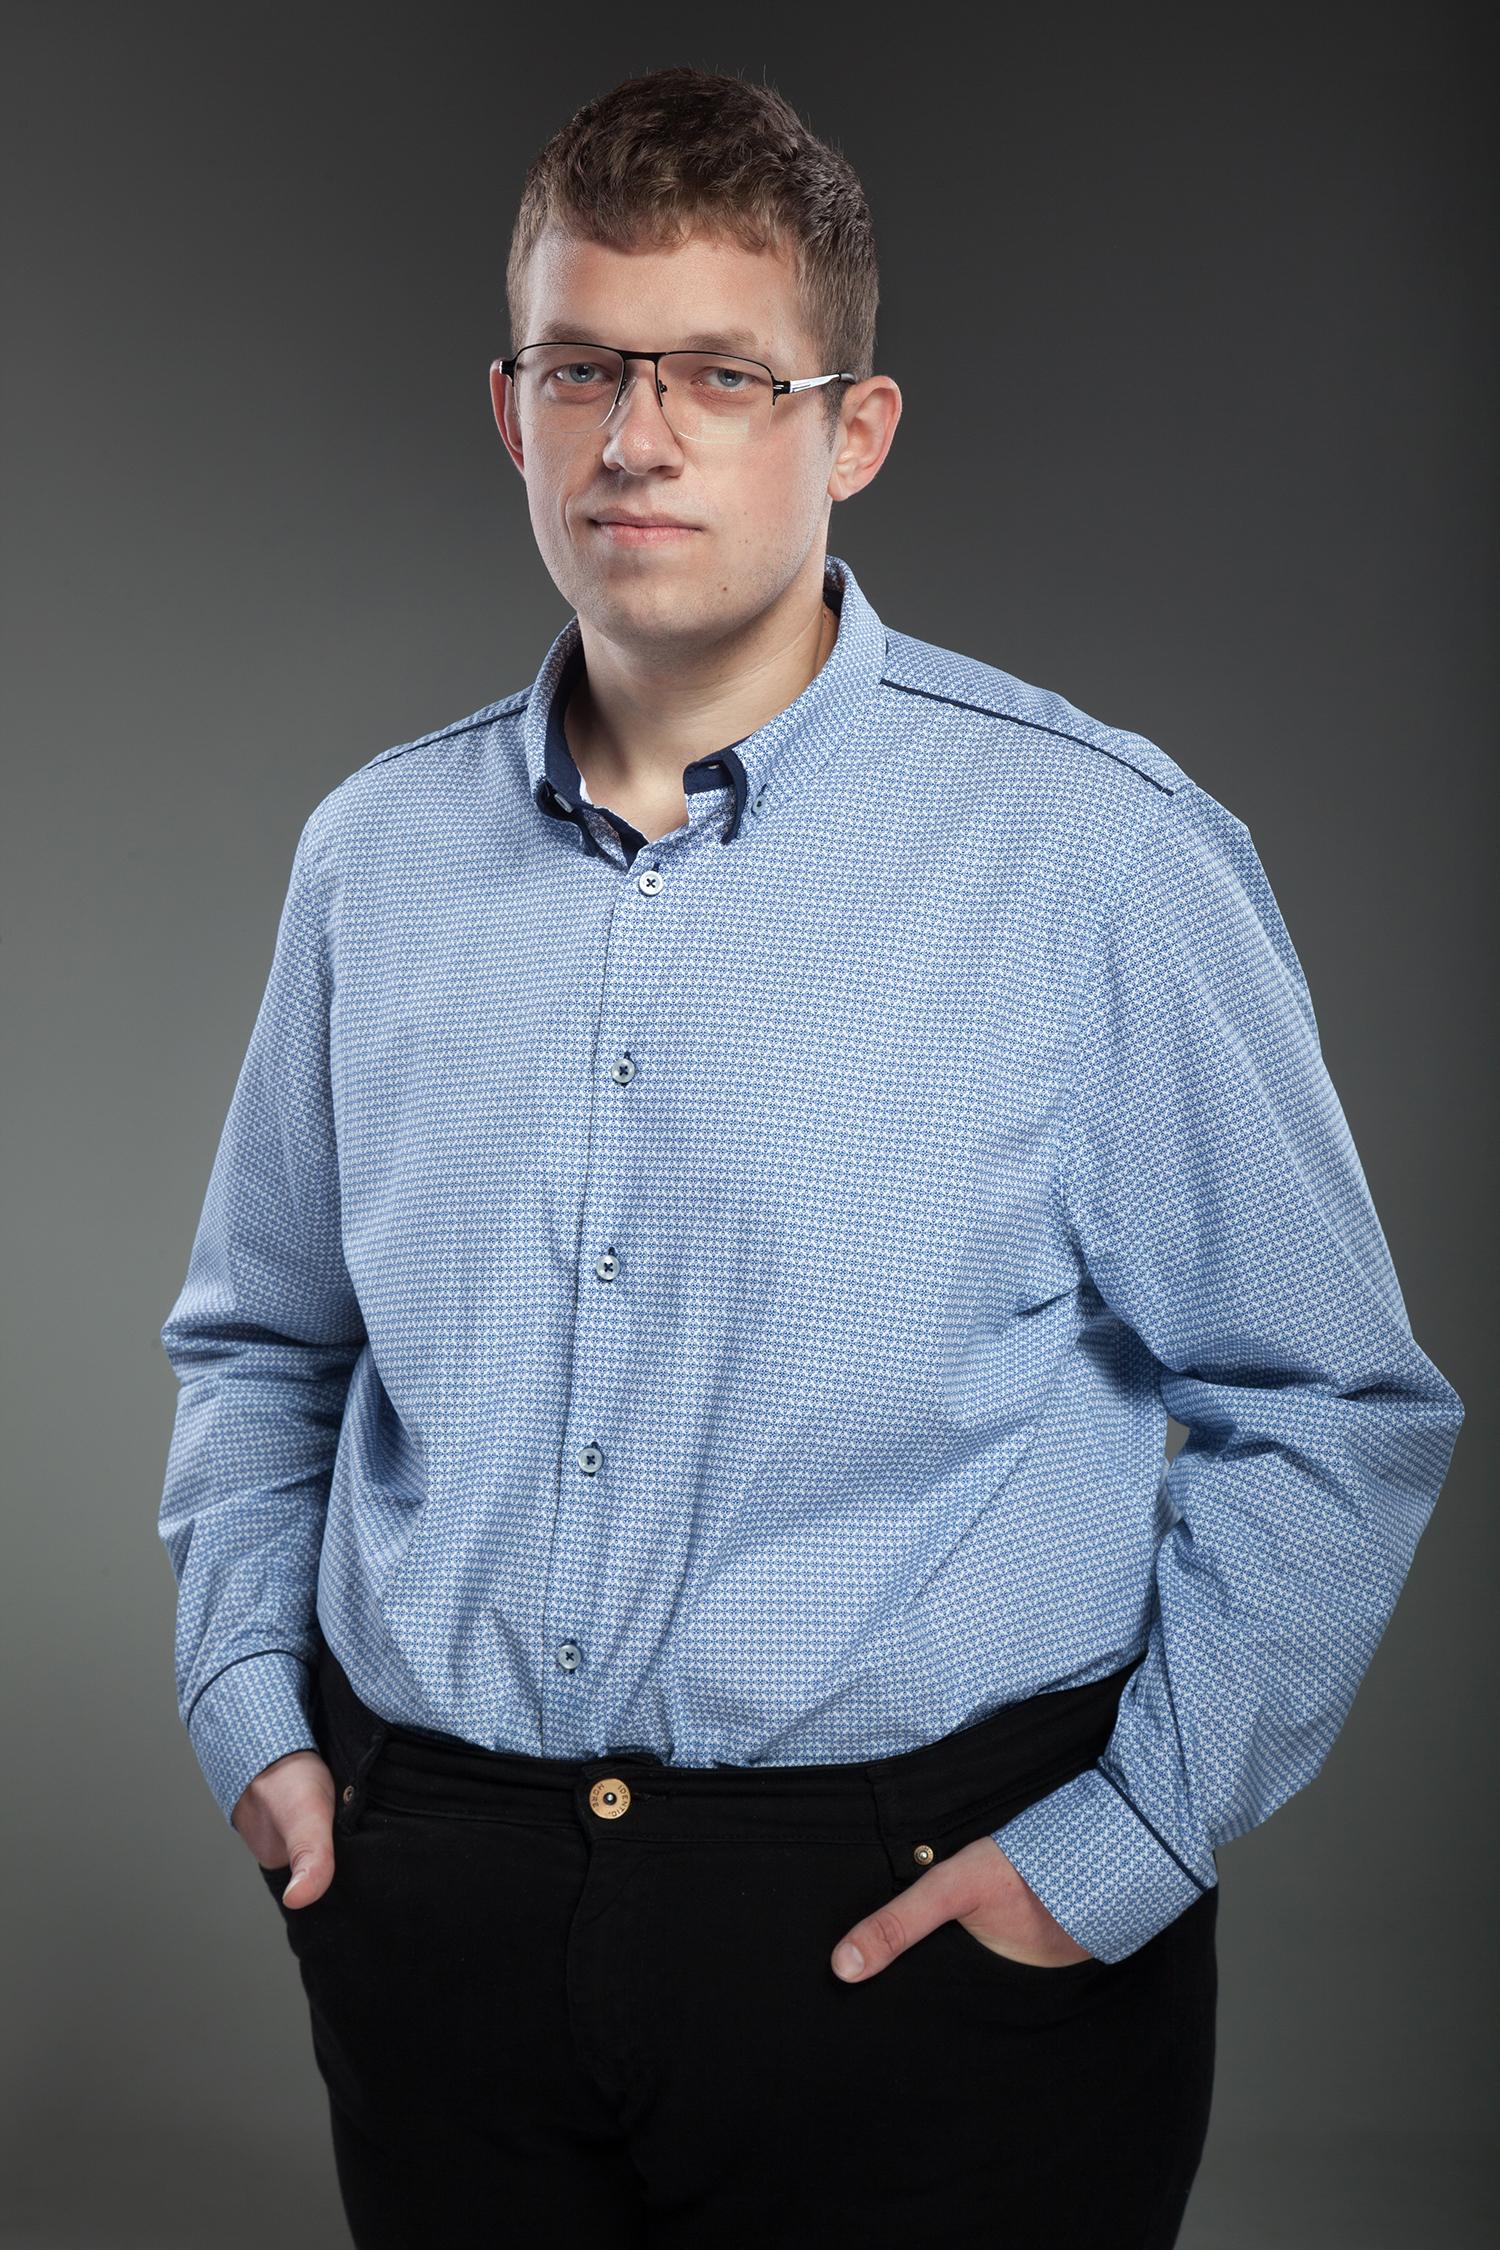 Róbert Balaško